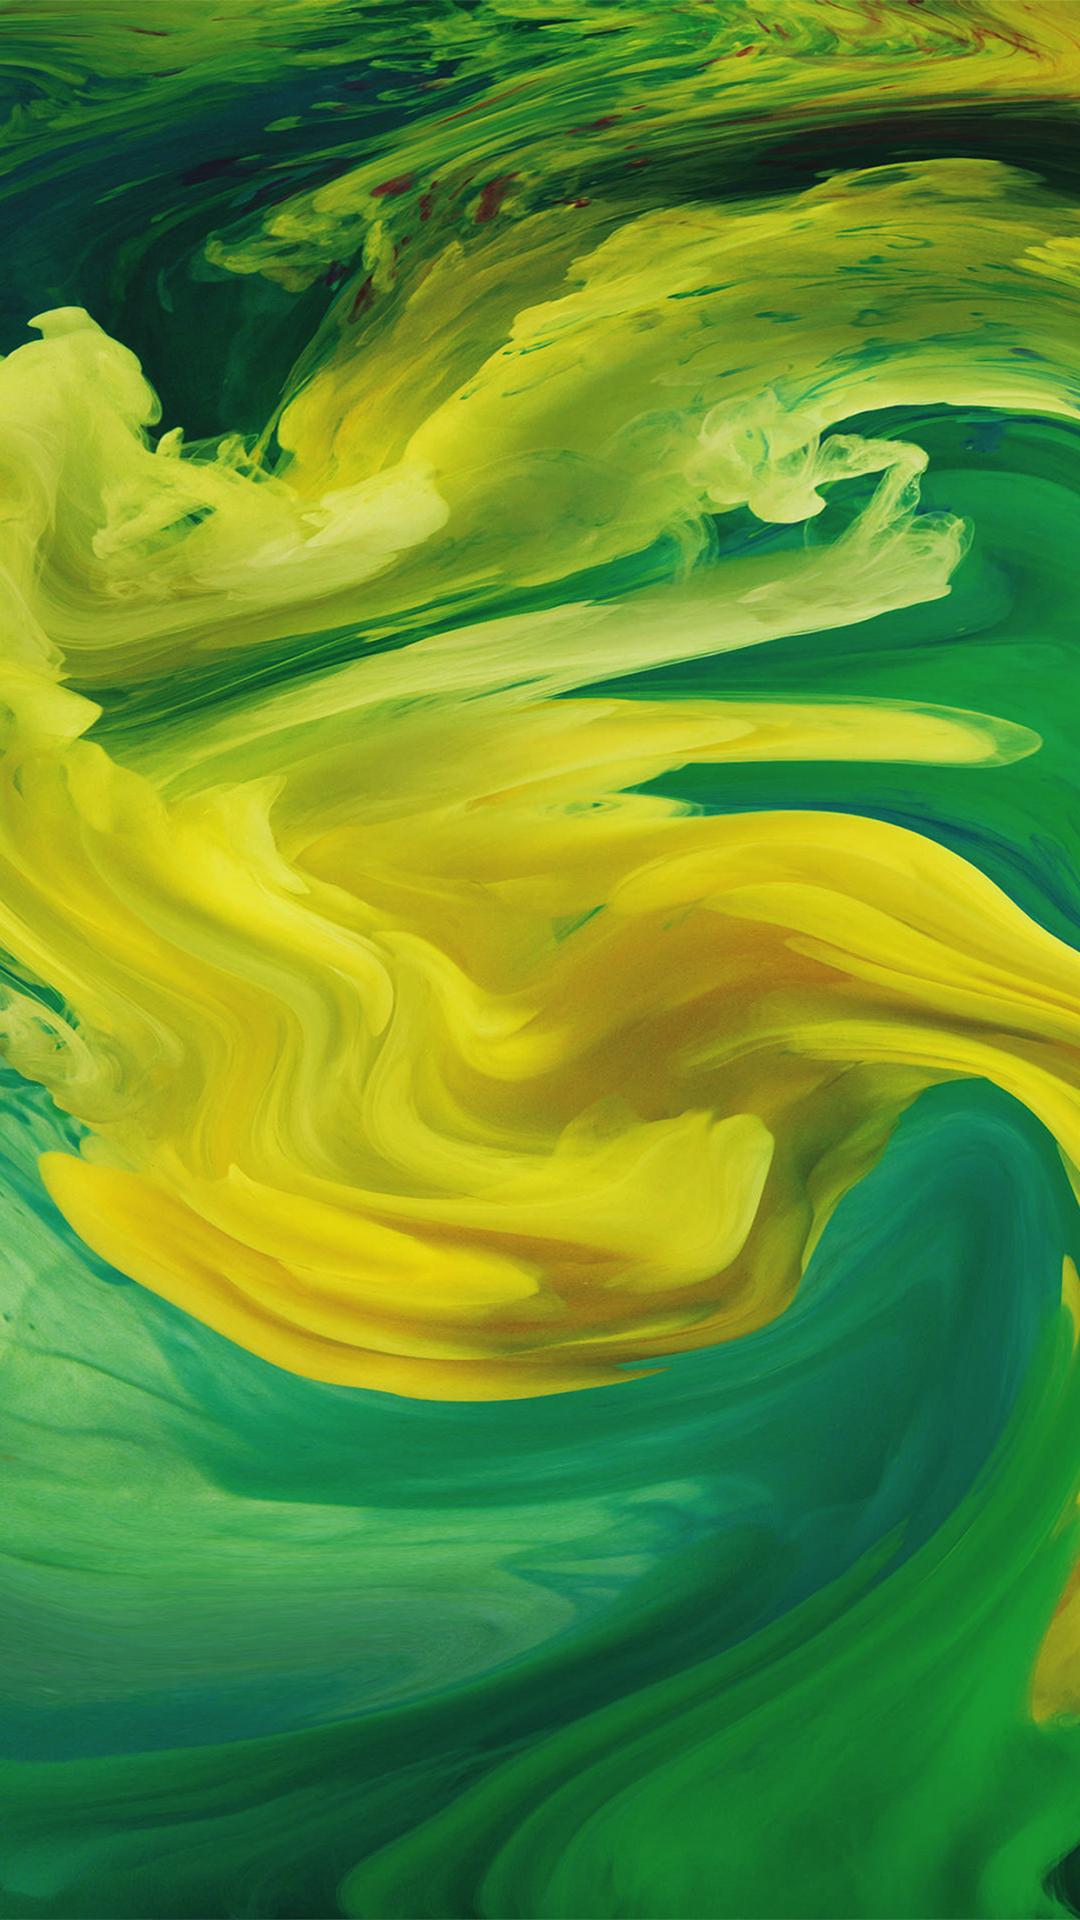 Hurricane iPhone 7 Wallpaper